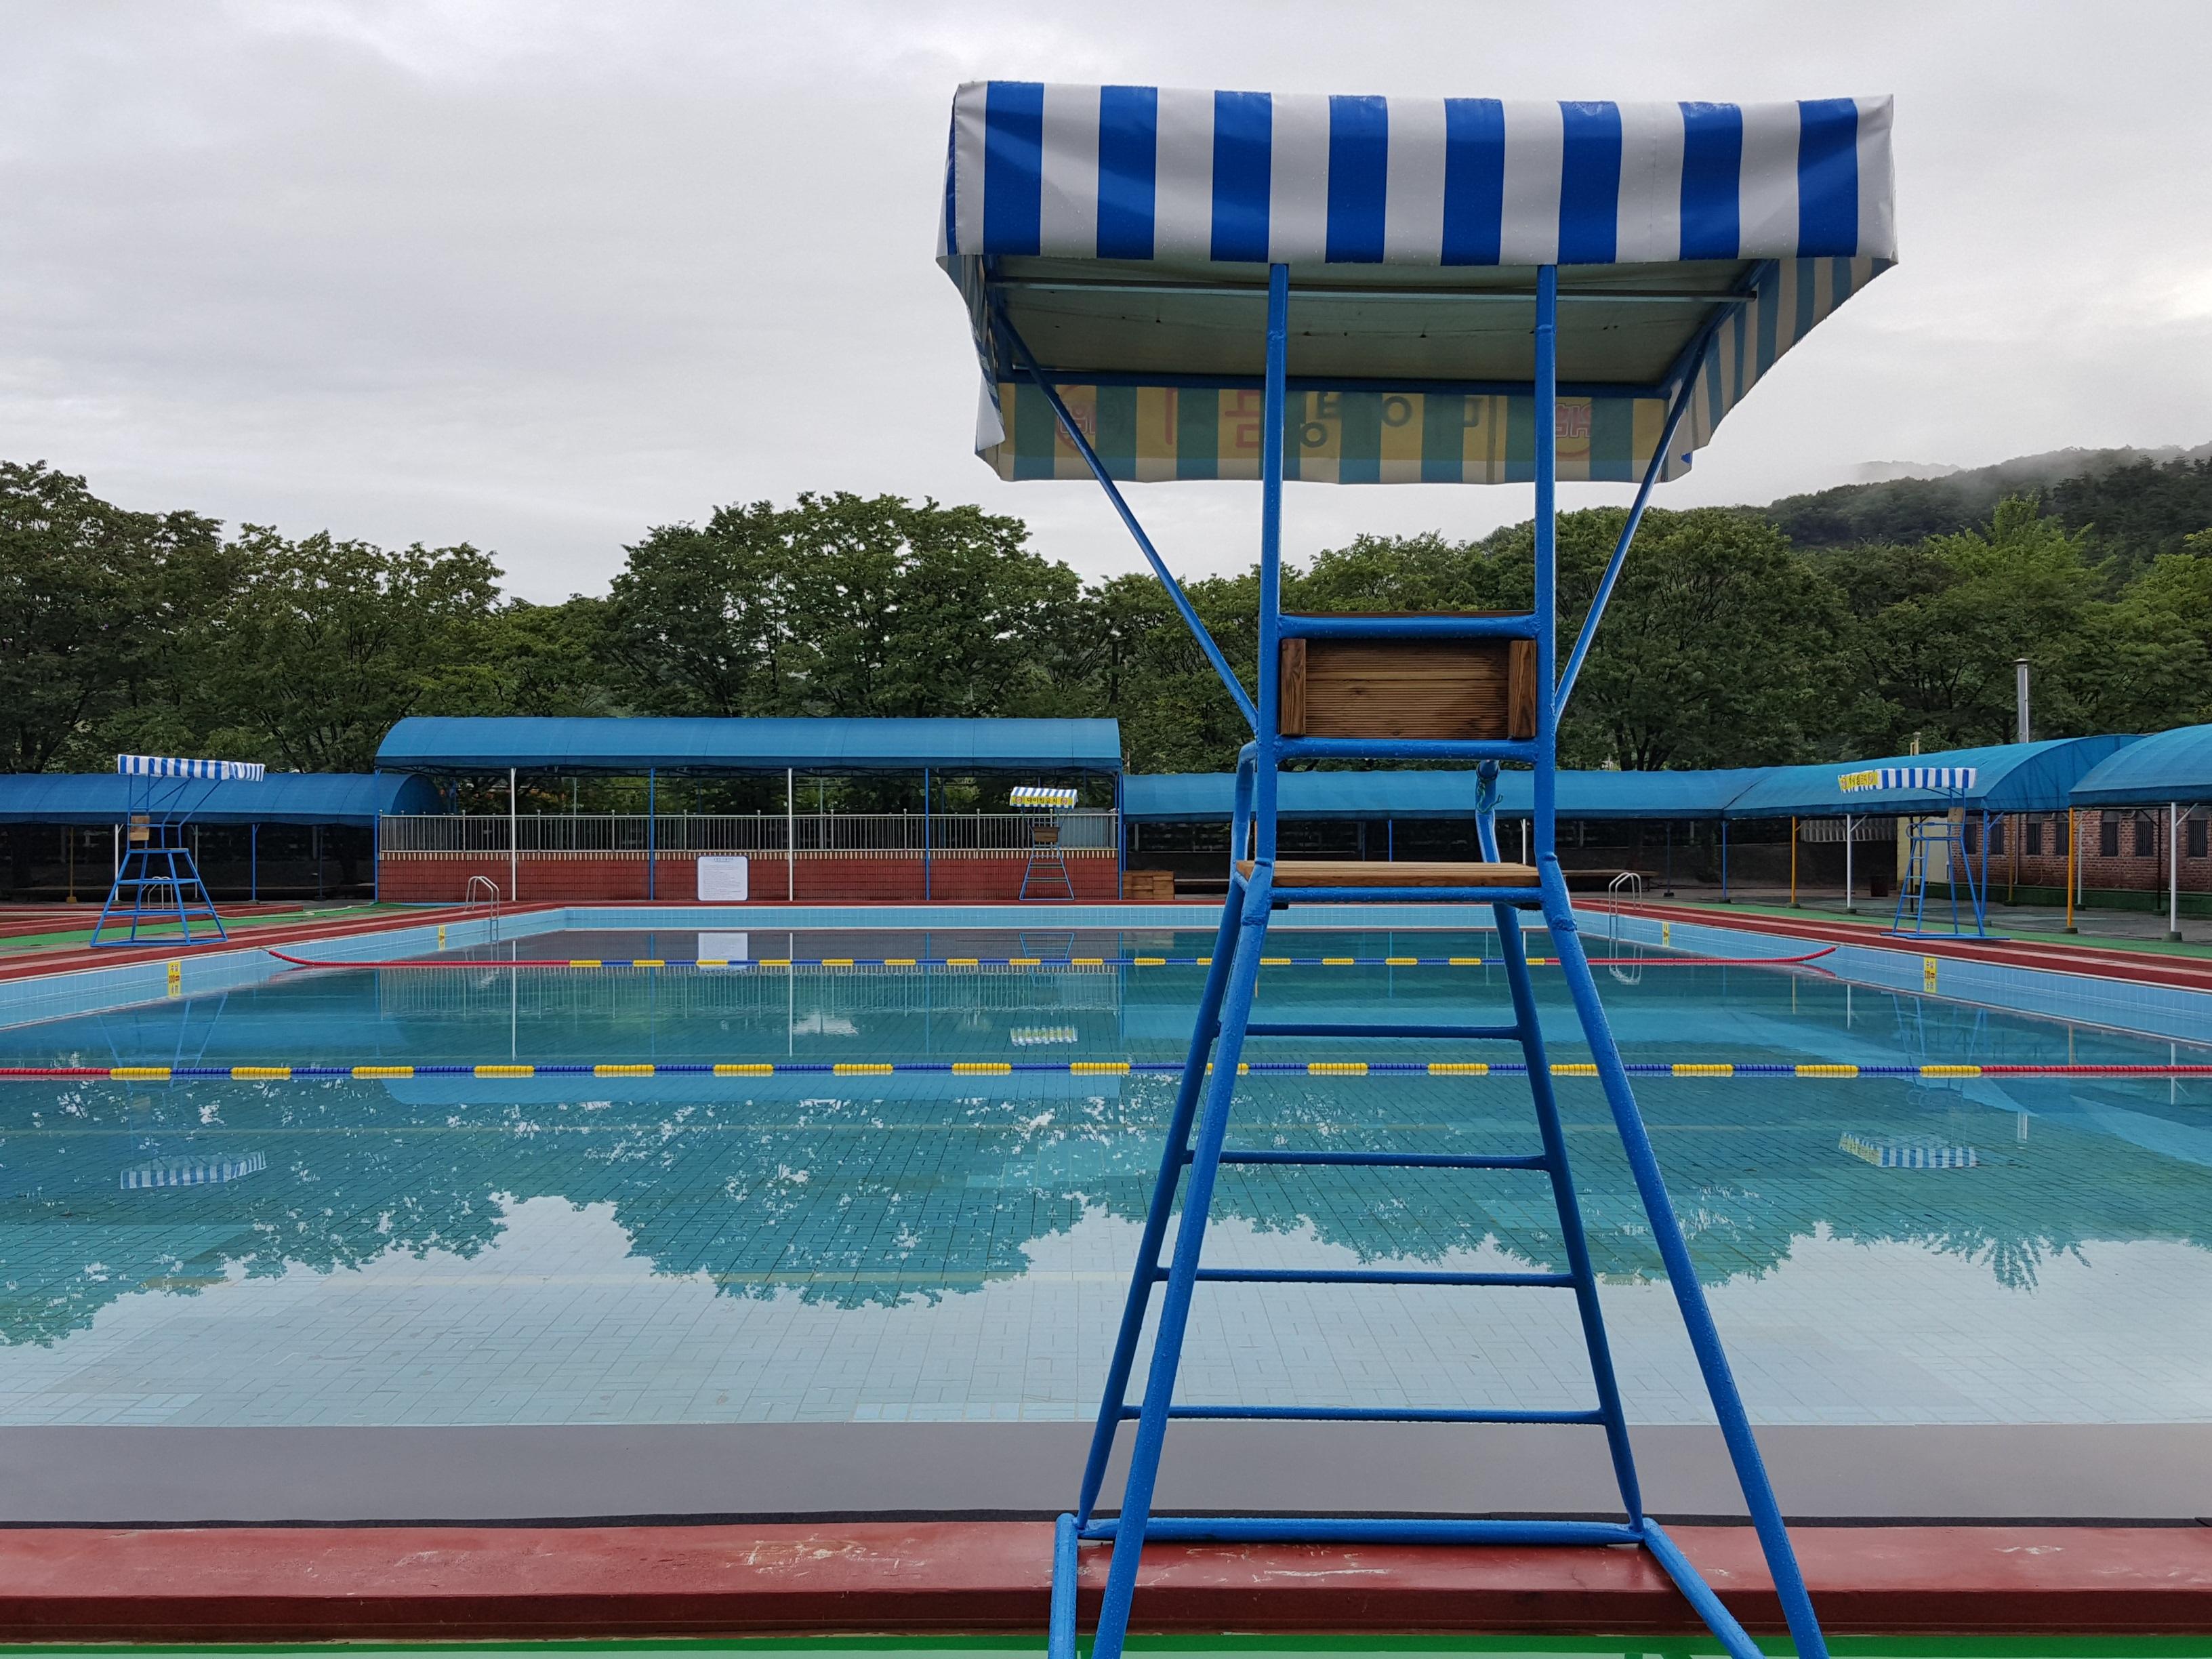 water-sky-summer-travel-recreation-pool-